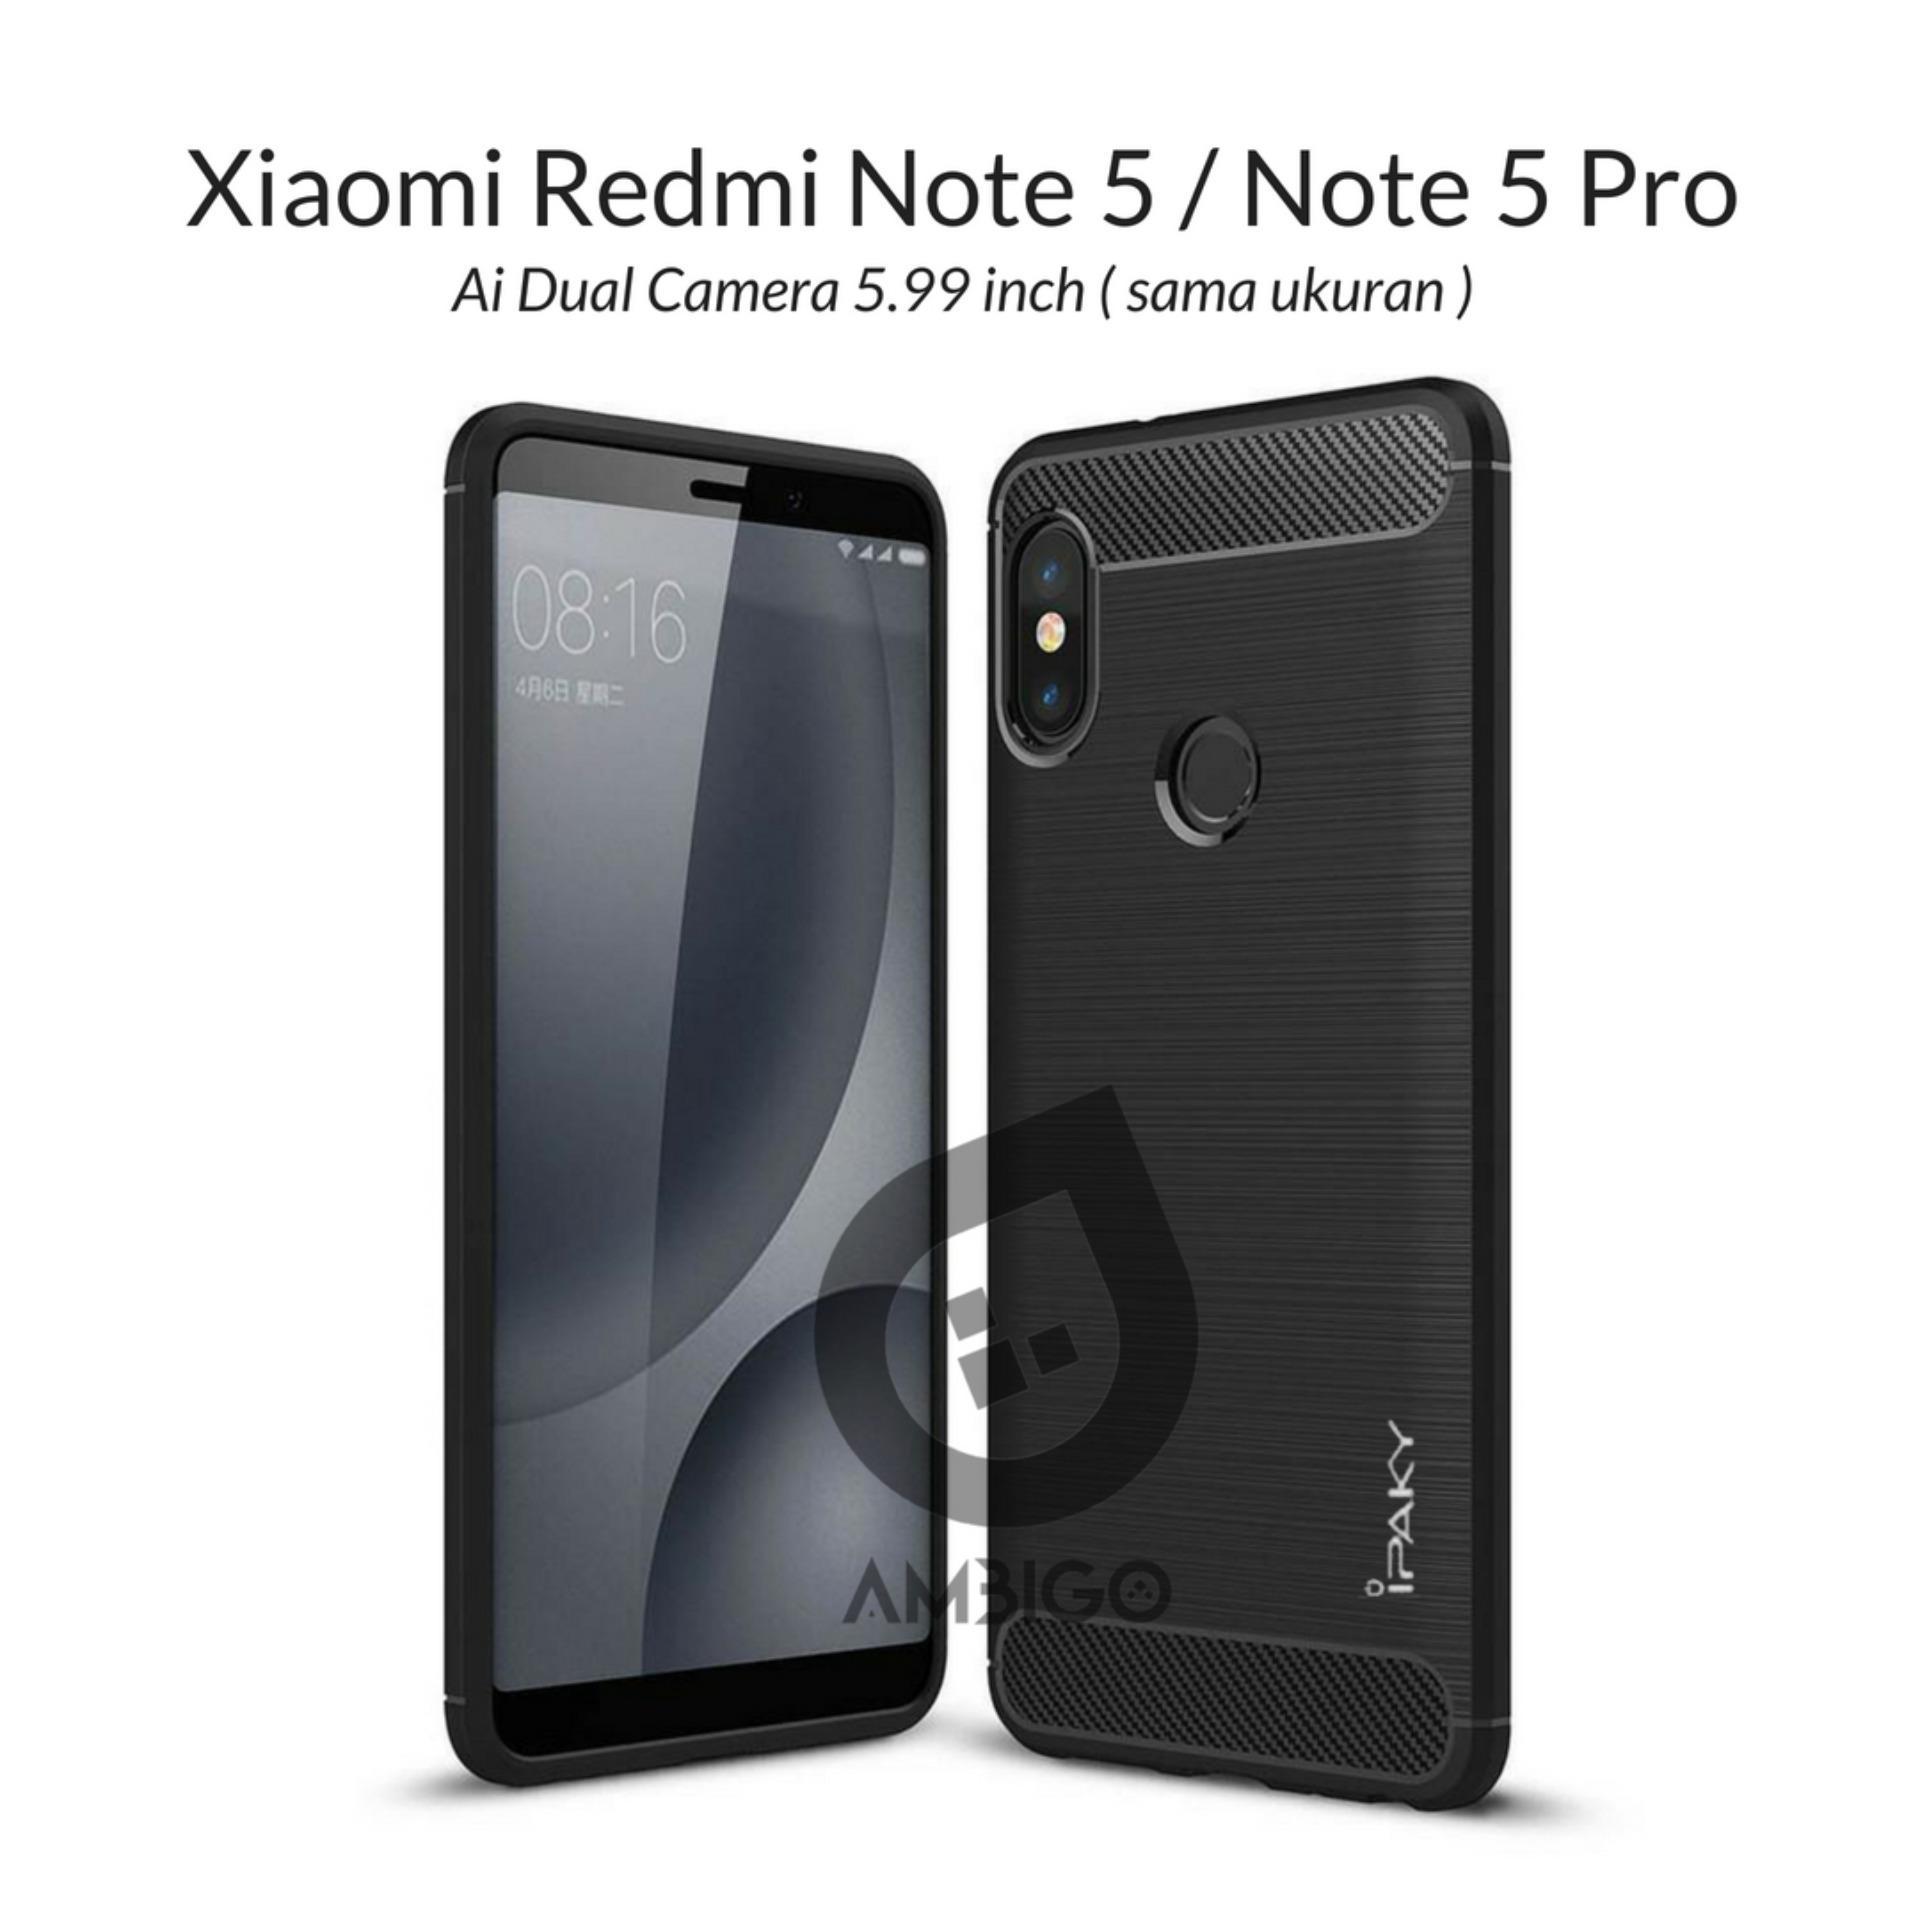 Jual Casing Hp Termurah Terlengkap Backdoor Tutup Belakang Samsung A5 A510 2016 Ambigo Case Xiaomi Redmi Note 5 Pro Ai Dual Camera Layar 599